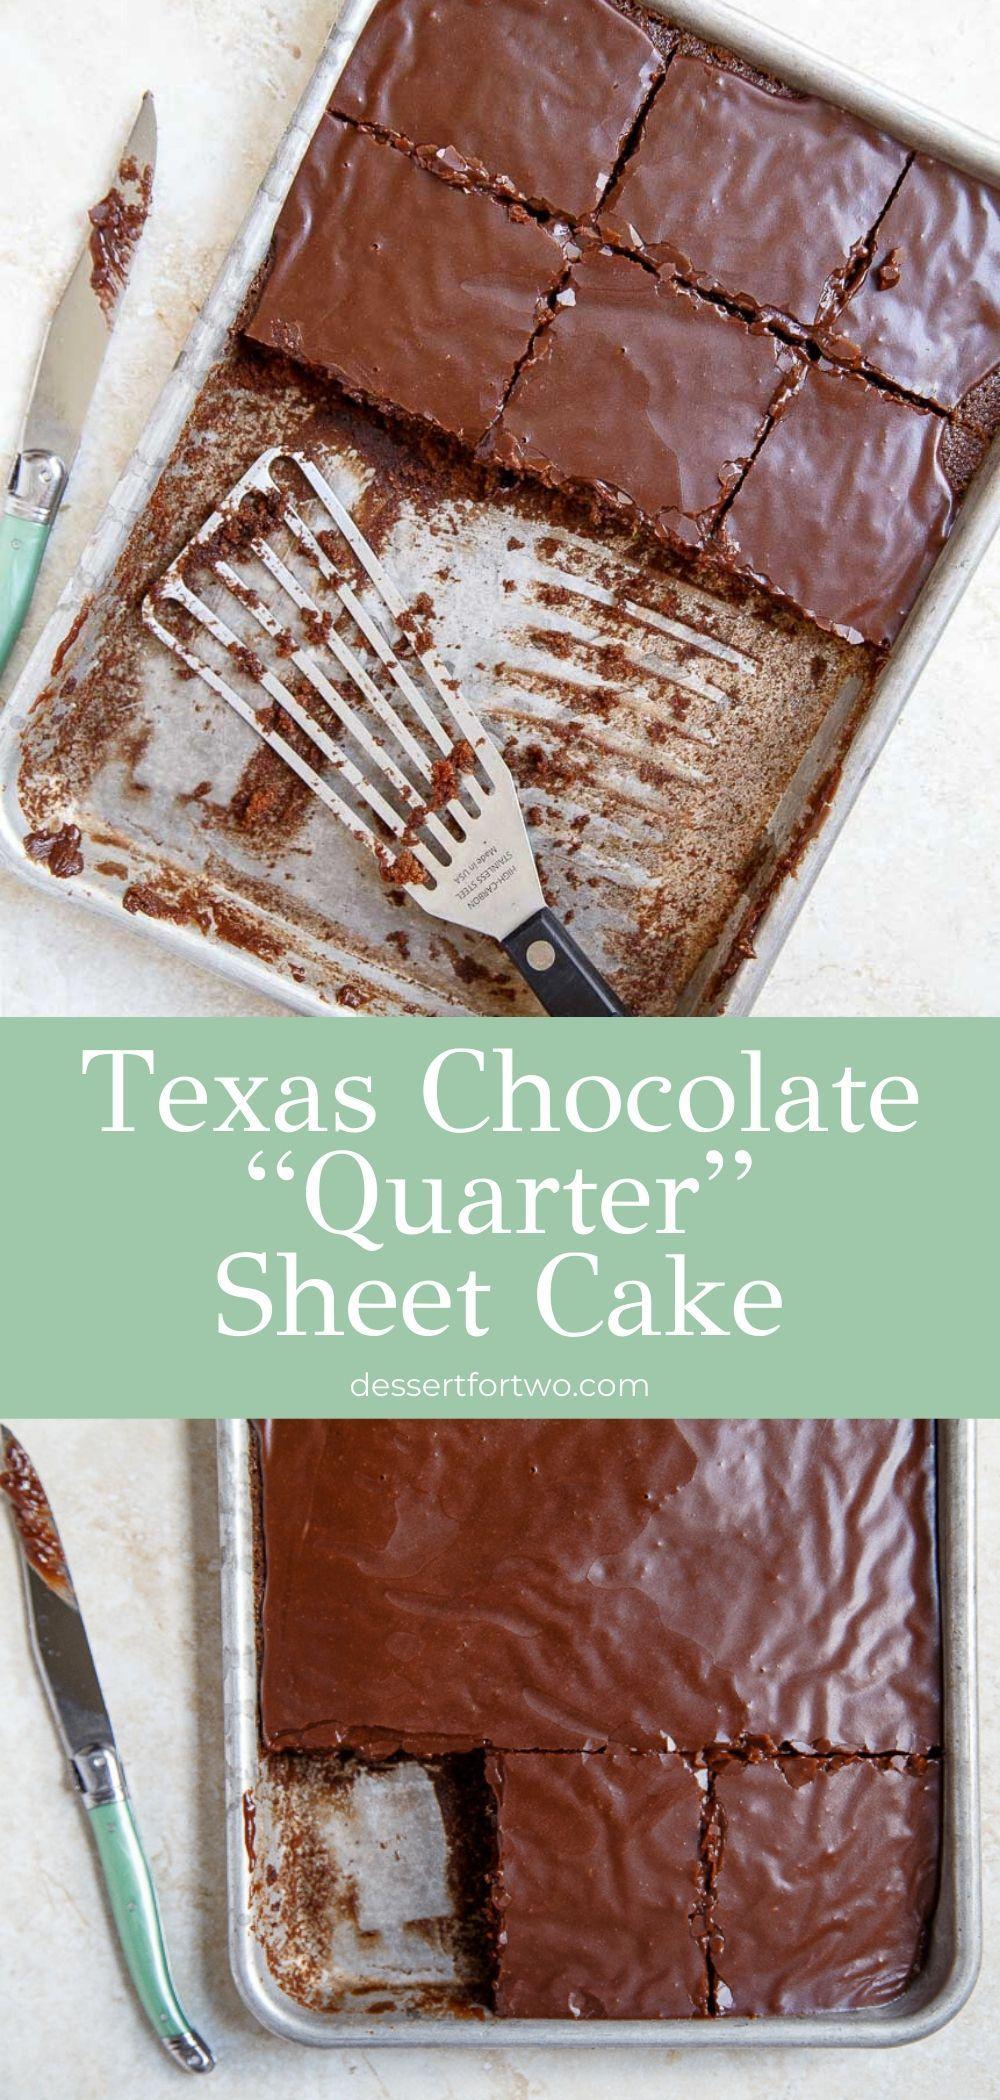 Quarter Sheet Cake - Texas Chocolate Sheet Cake